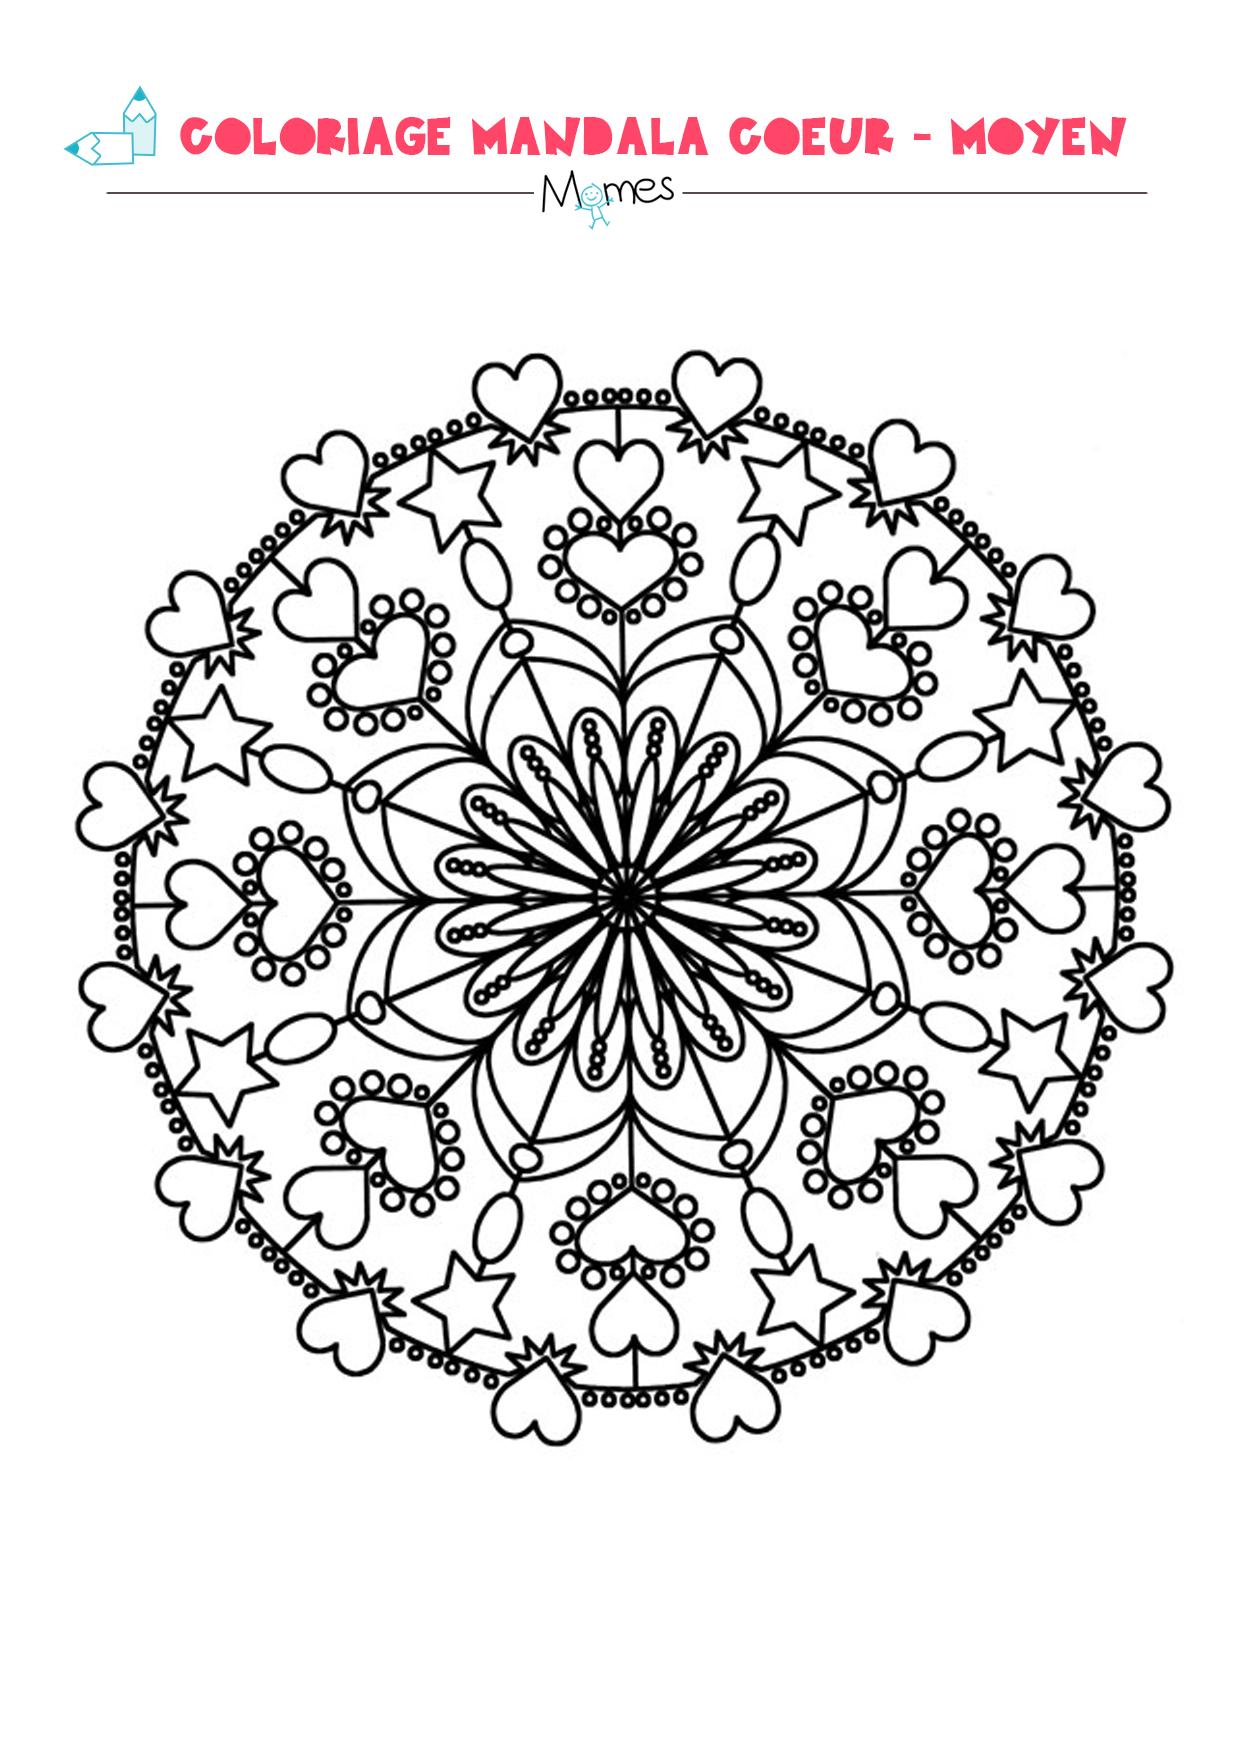 Coloriage mandala coeur et amour - Mandala amour ...